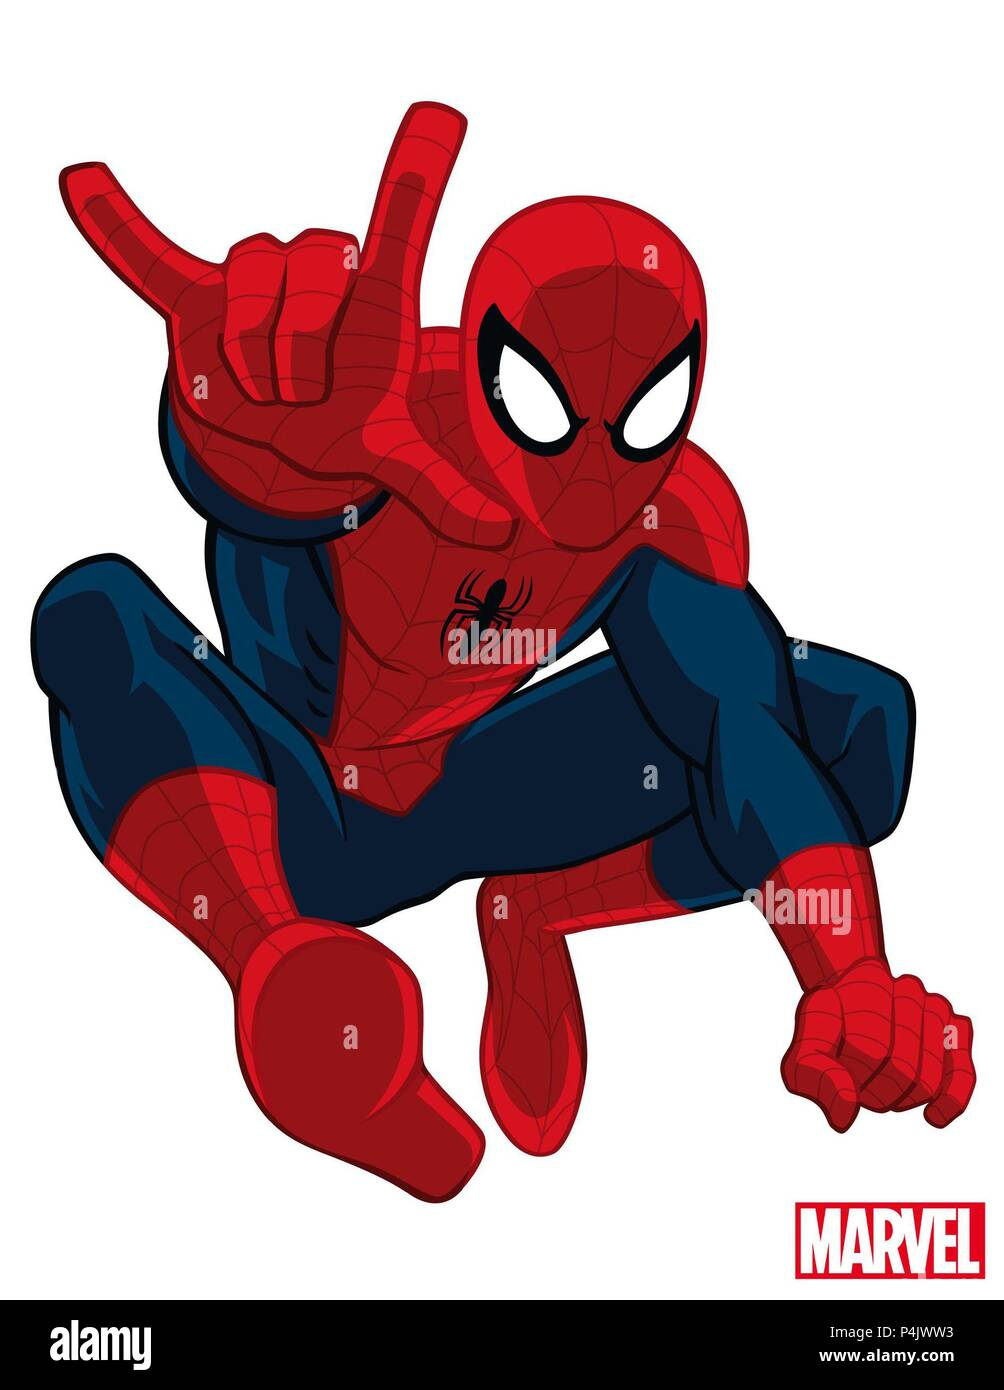 marvel ultimate spiderman season 1 episode 7